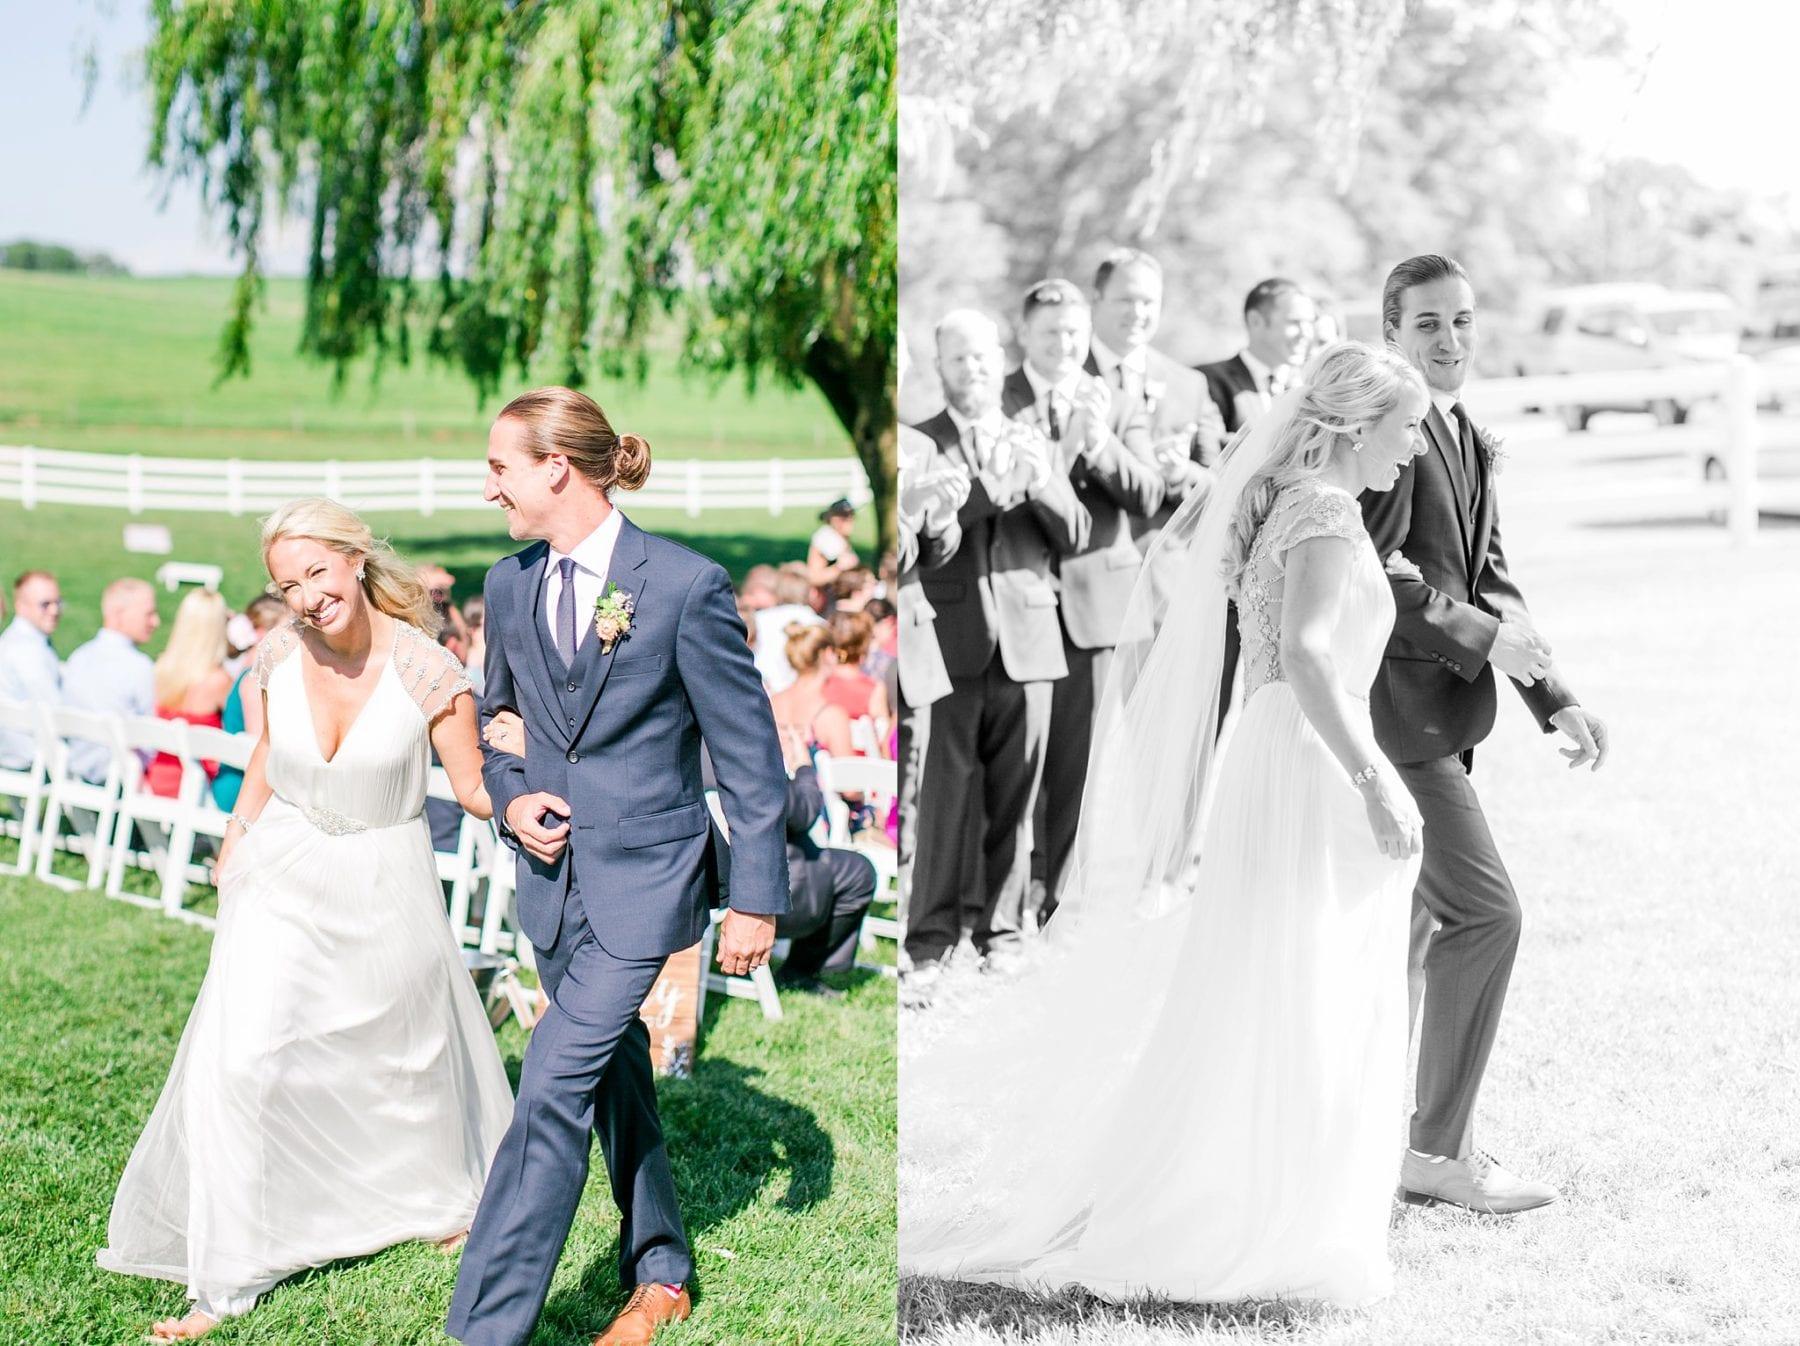 Pond View Farm Wedding Photos Maryland Wedding Photographer Kristen & Ryan Megan Kelsey Photography Blog-131.jpg